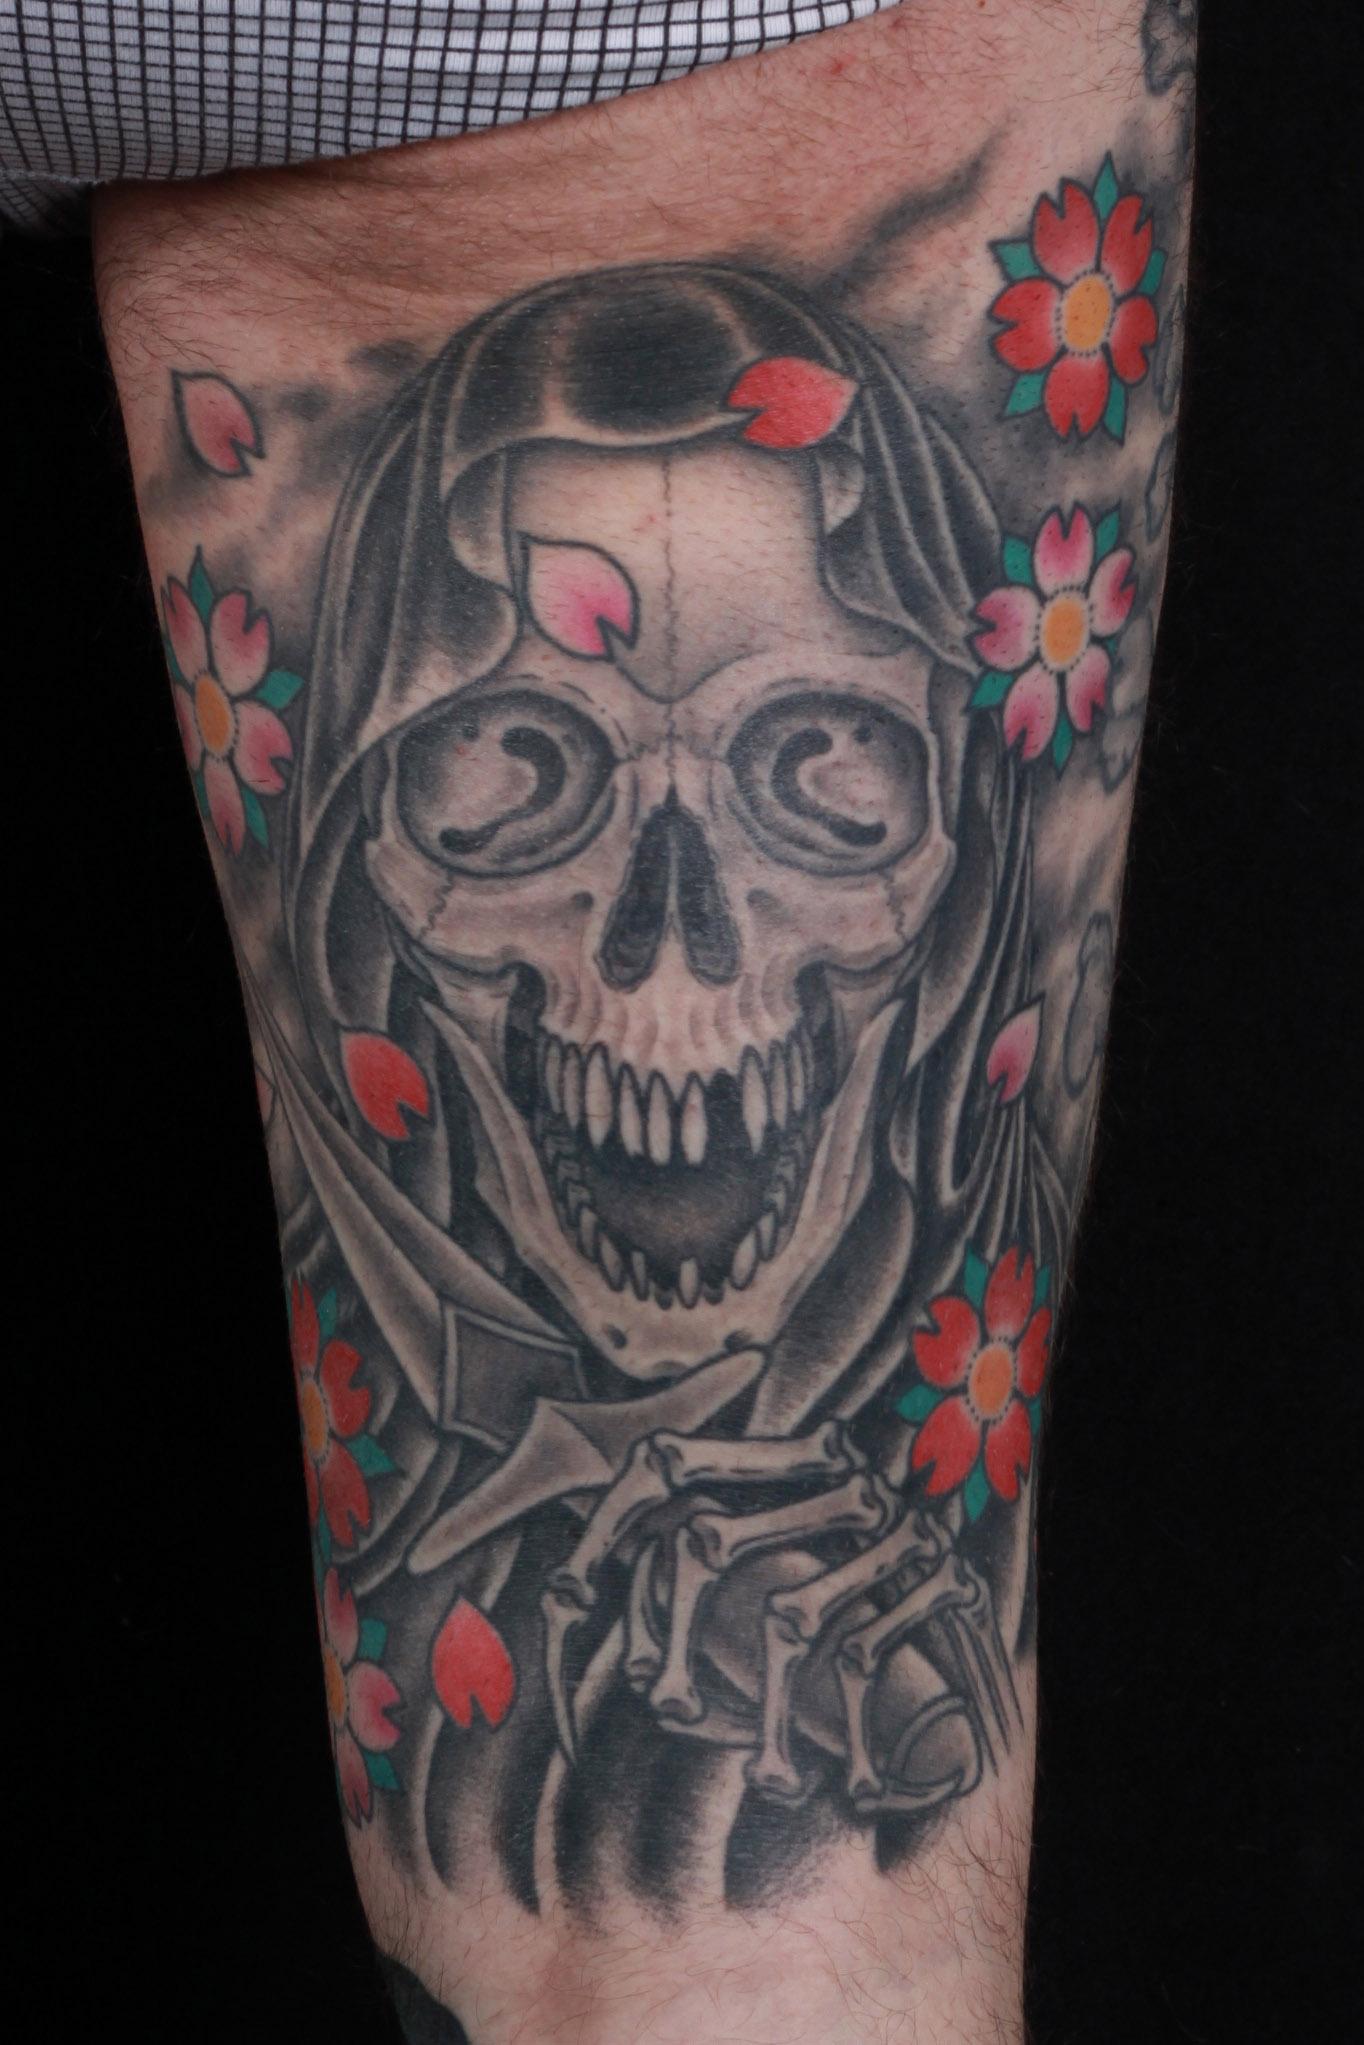 brian-thurow-dedication-tattoo-thigh-reaper-cherry-blossoms